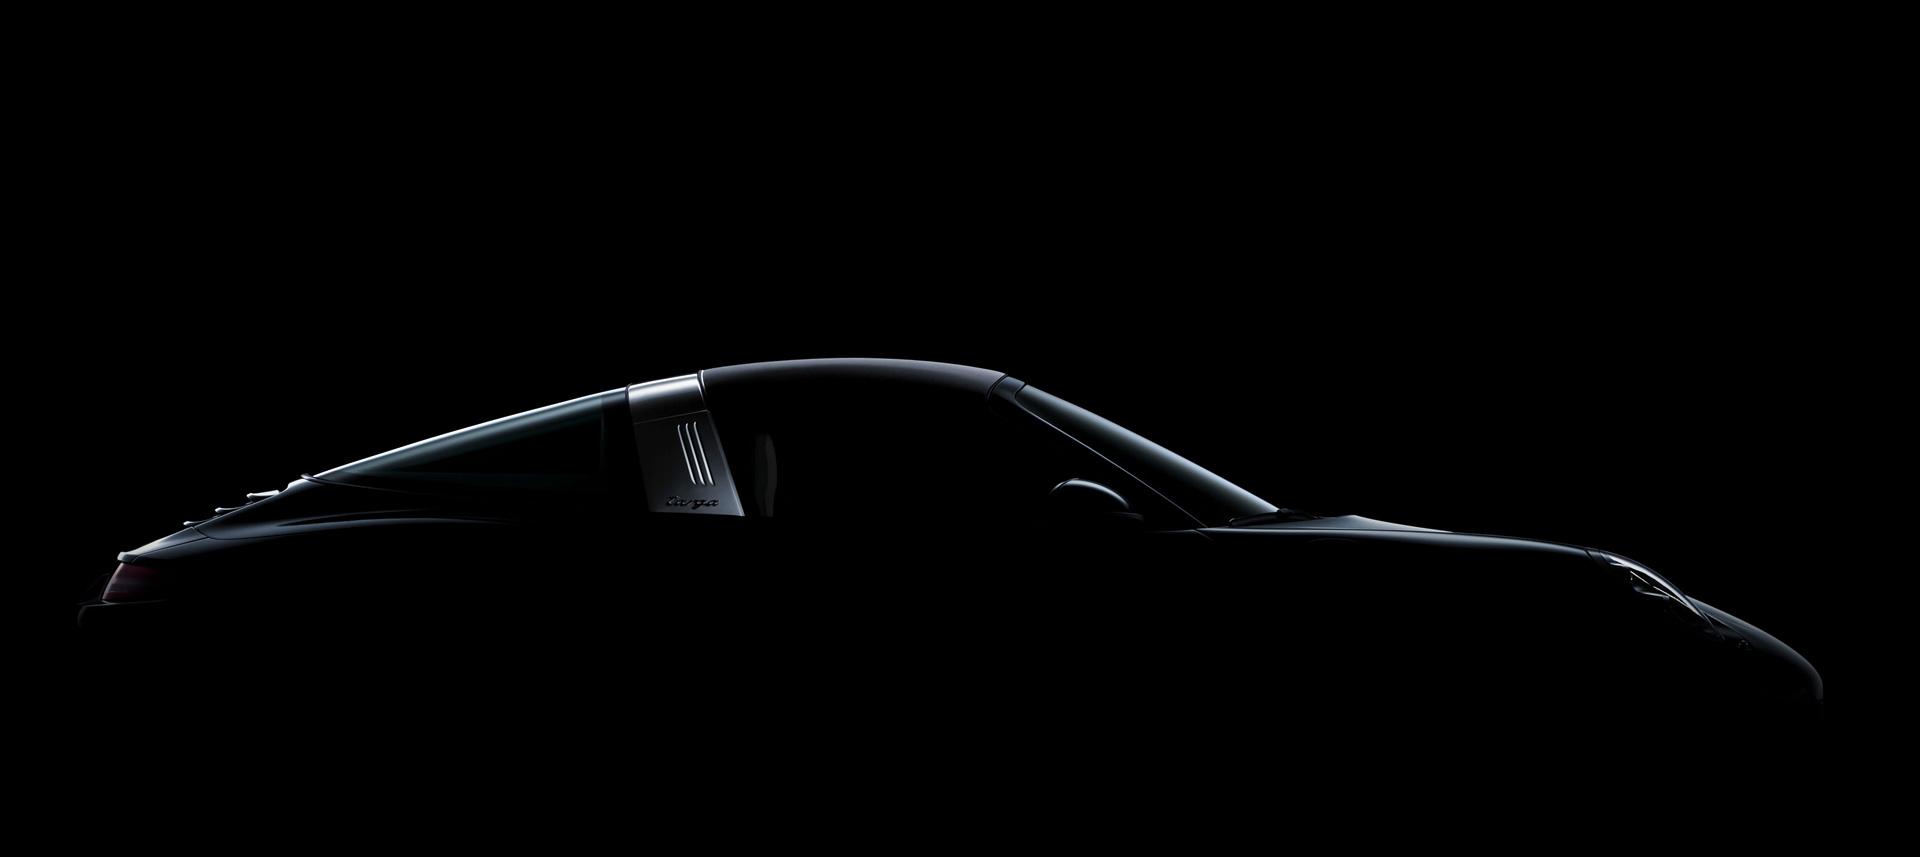 Porsche Targa Uwe Breitkopf Photography